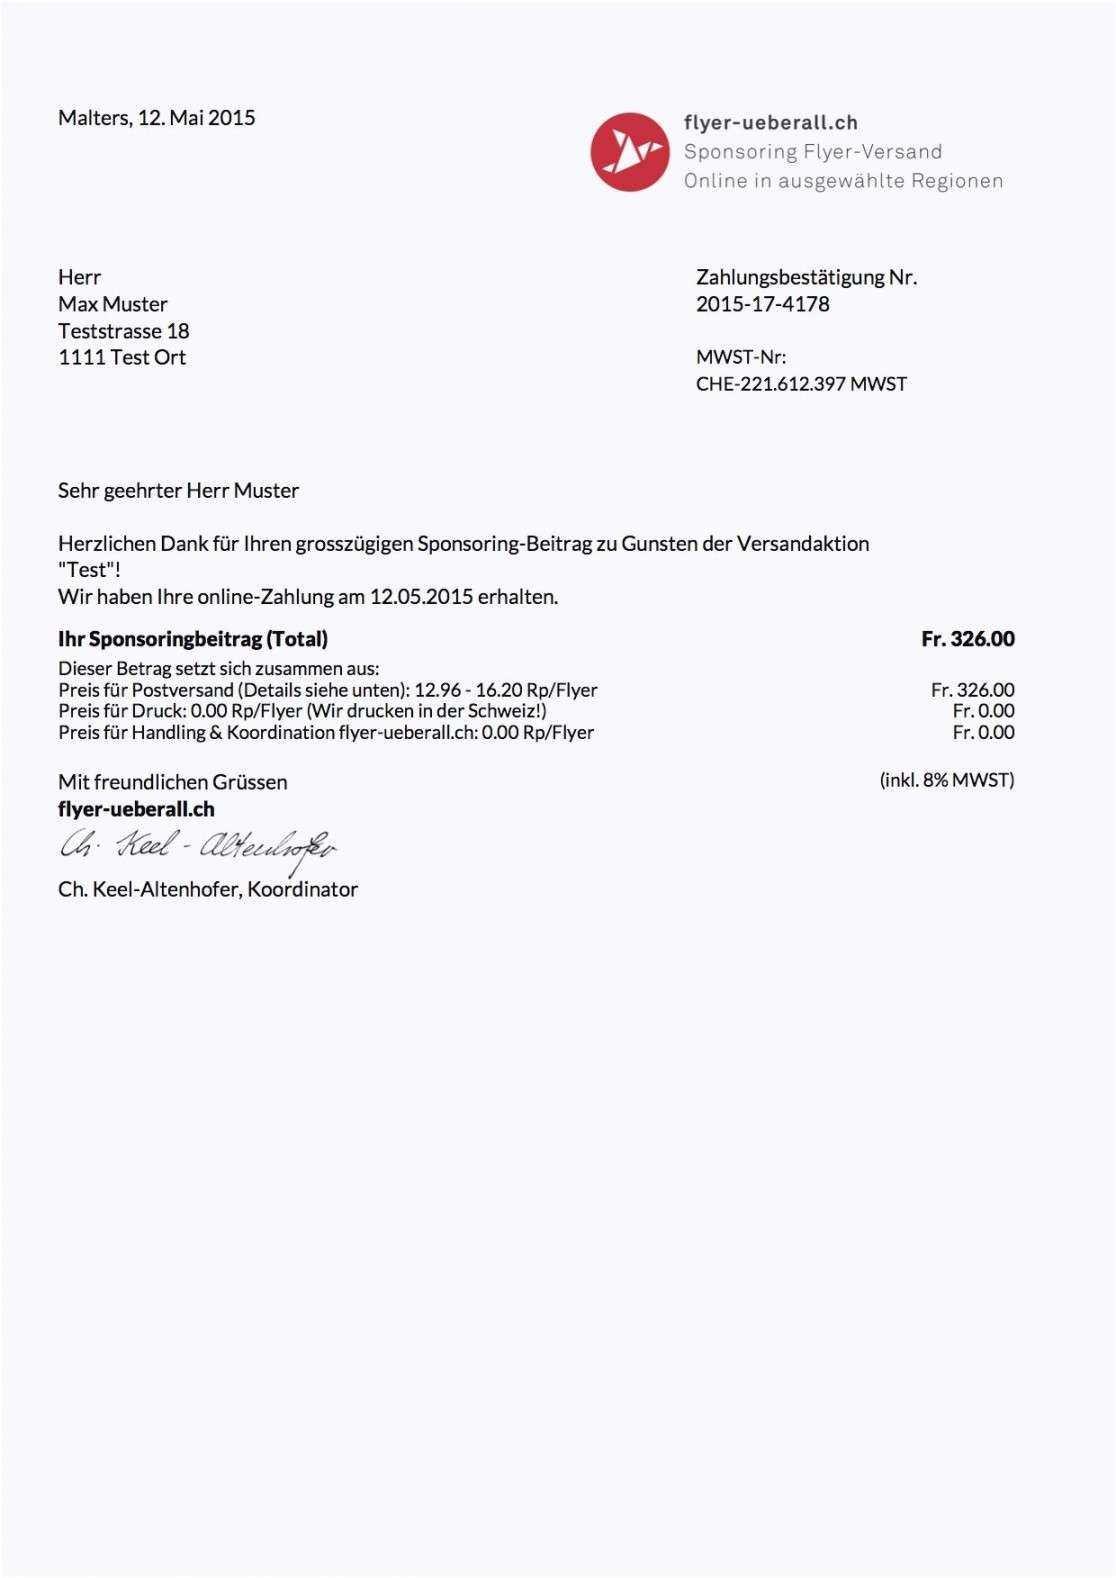 Rustikal Gelangensbestatigung Vorlage Word Vorlagen Lebenslauf Vorlagen Word Lebenslauf